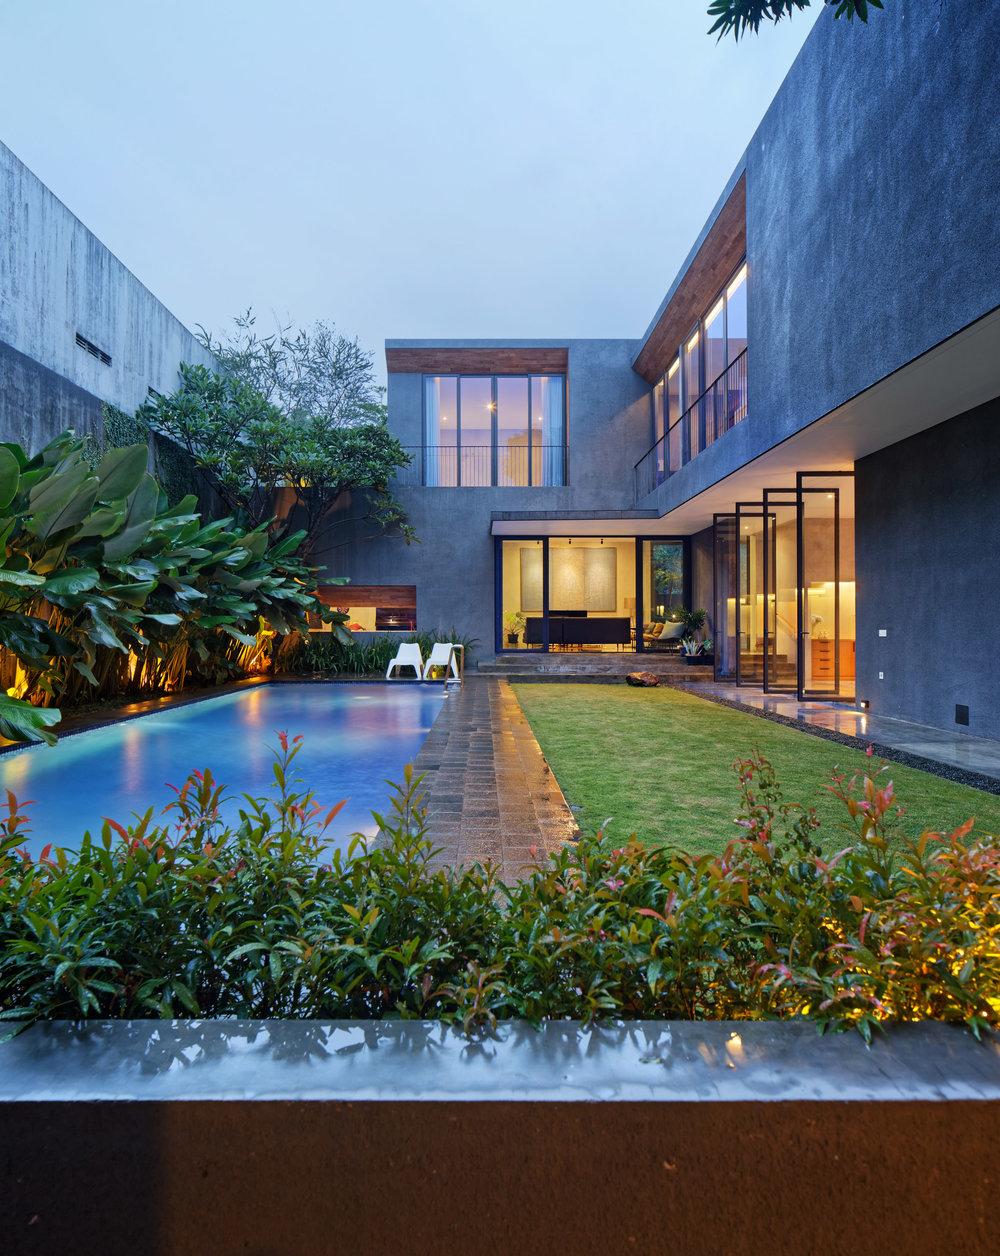 house-inside-outside-tamara-wibowo-architecture-residential-indonesia_dezeen_2364_col_4.jpg